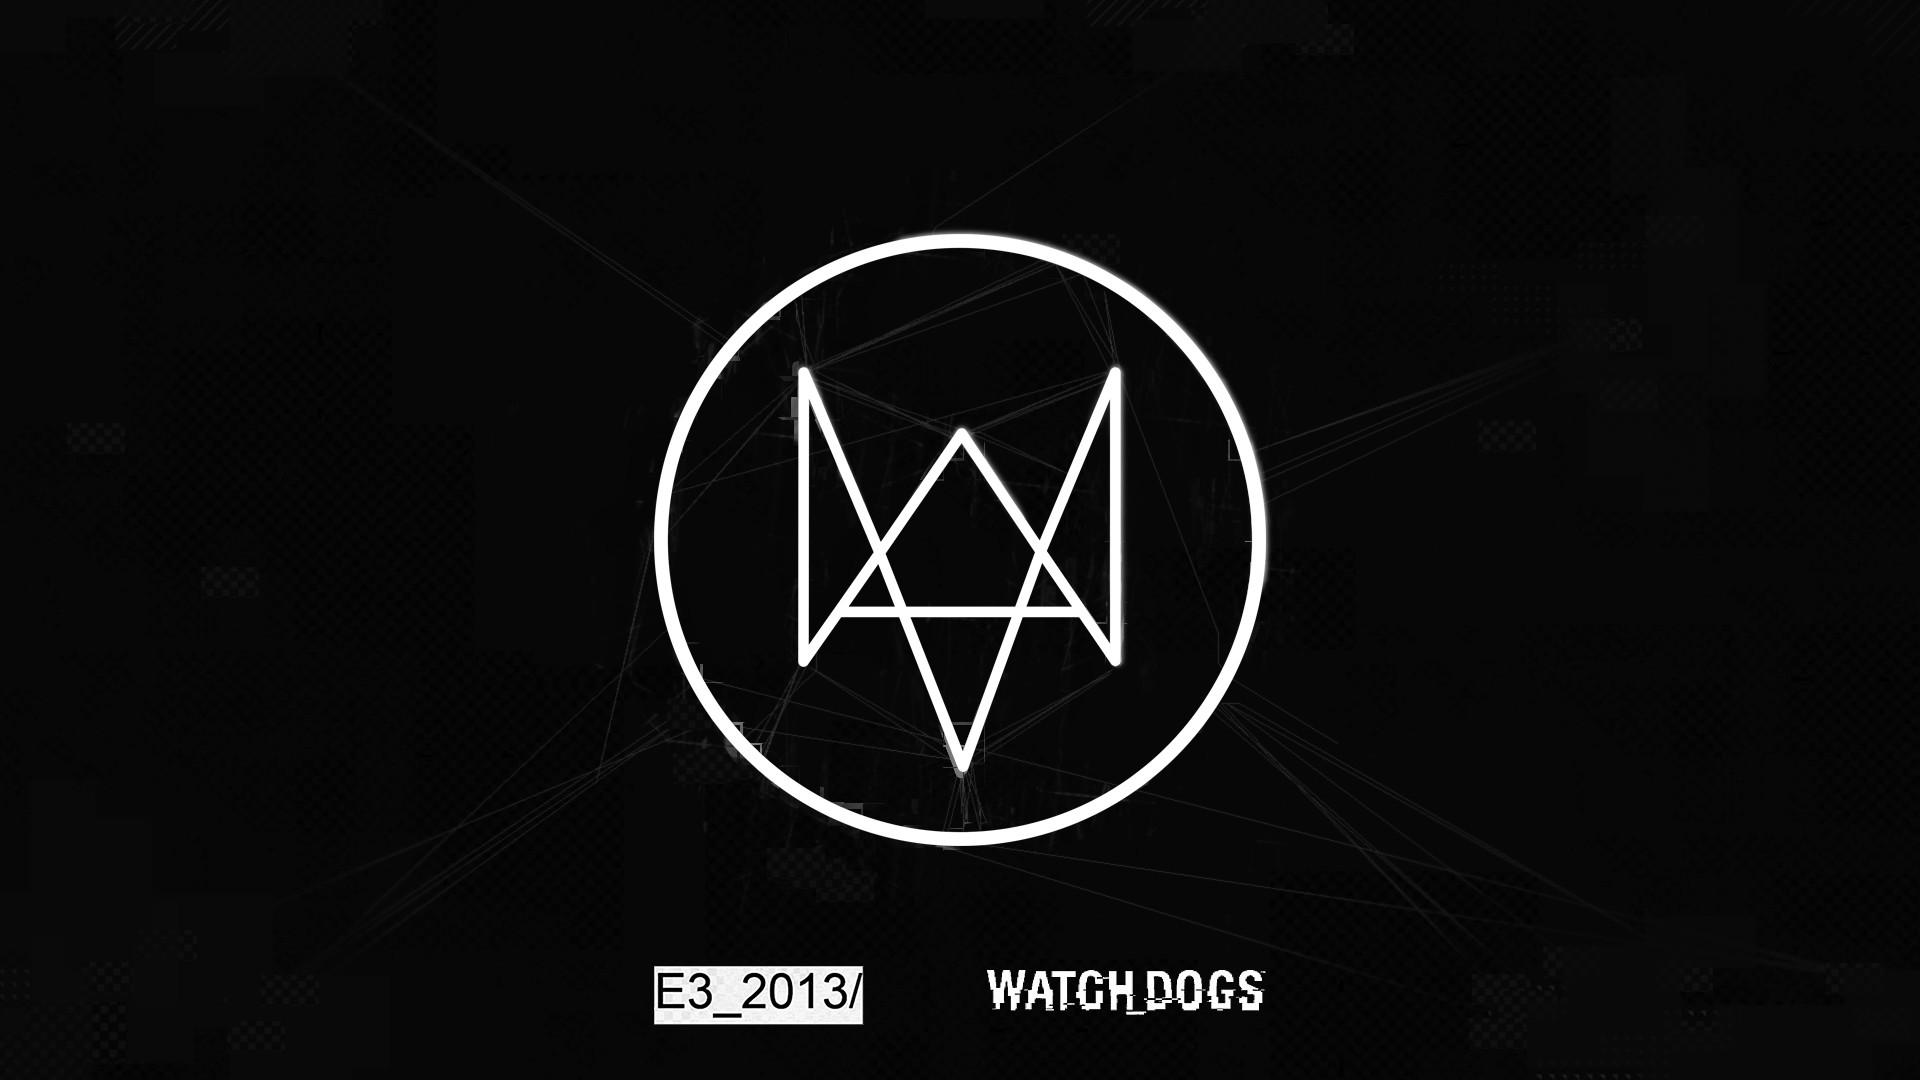 Watch Dogs Logo: Fox?